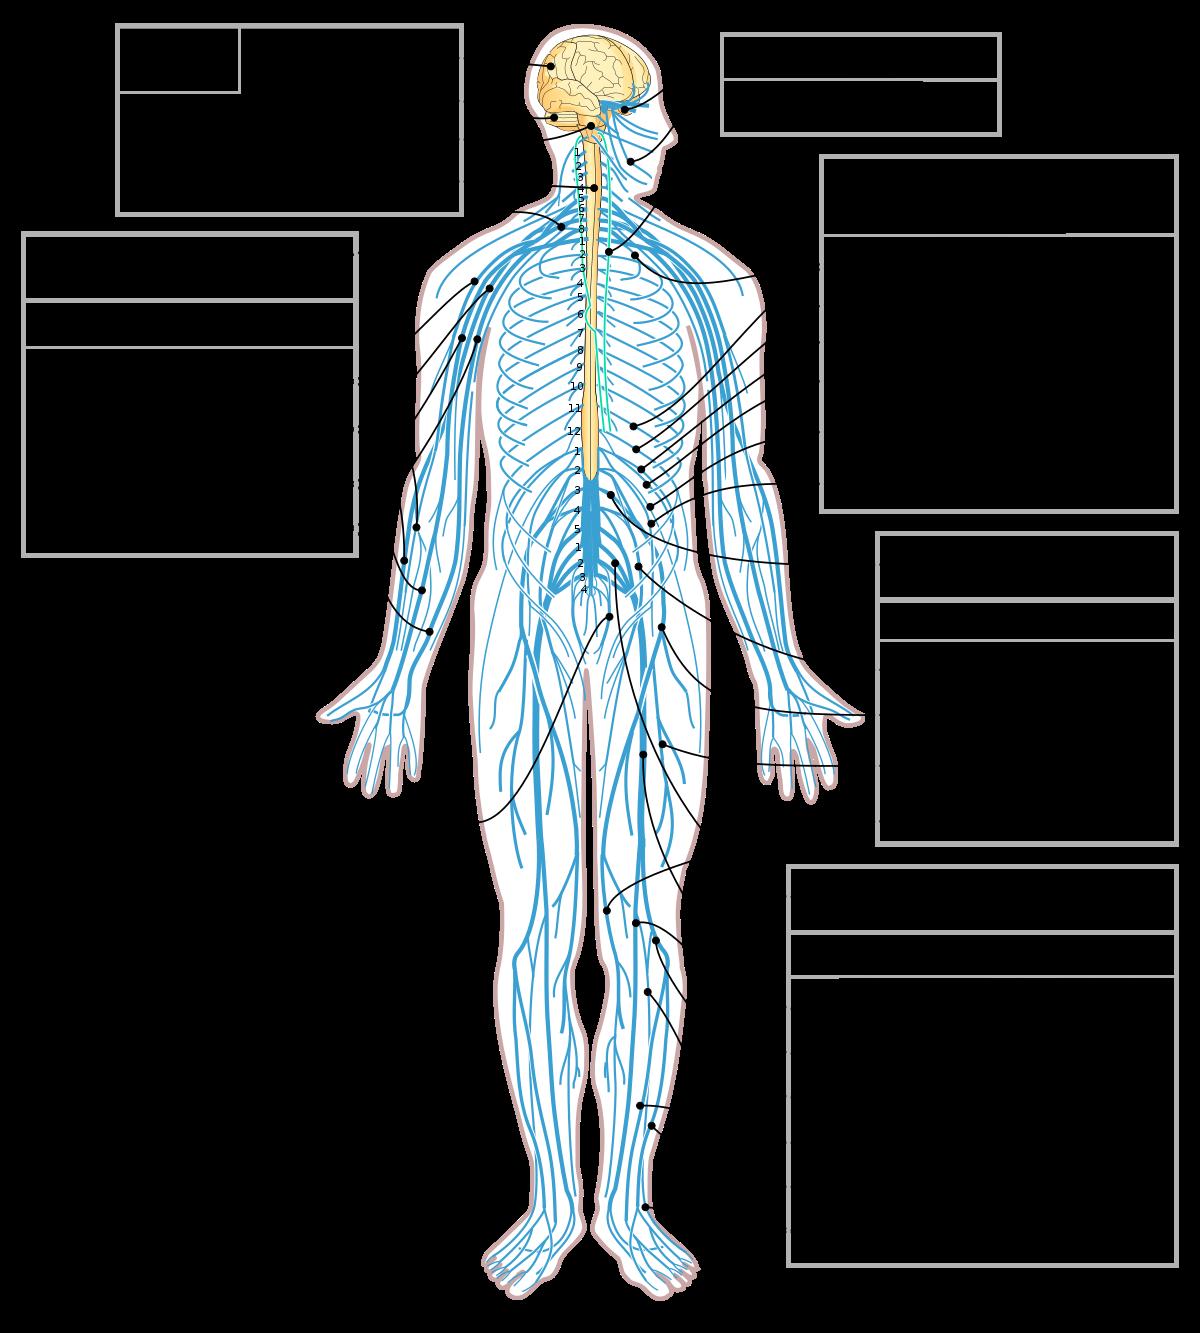 بالصور جسم الانسان بالصور , اكتشف ما في داخل جسمك بالصور 1291